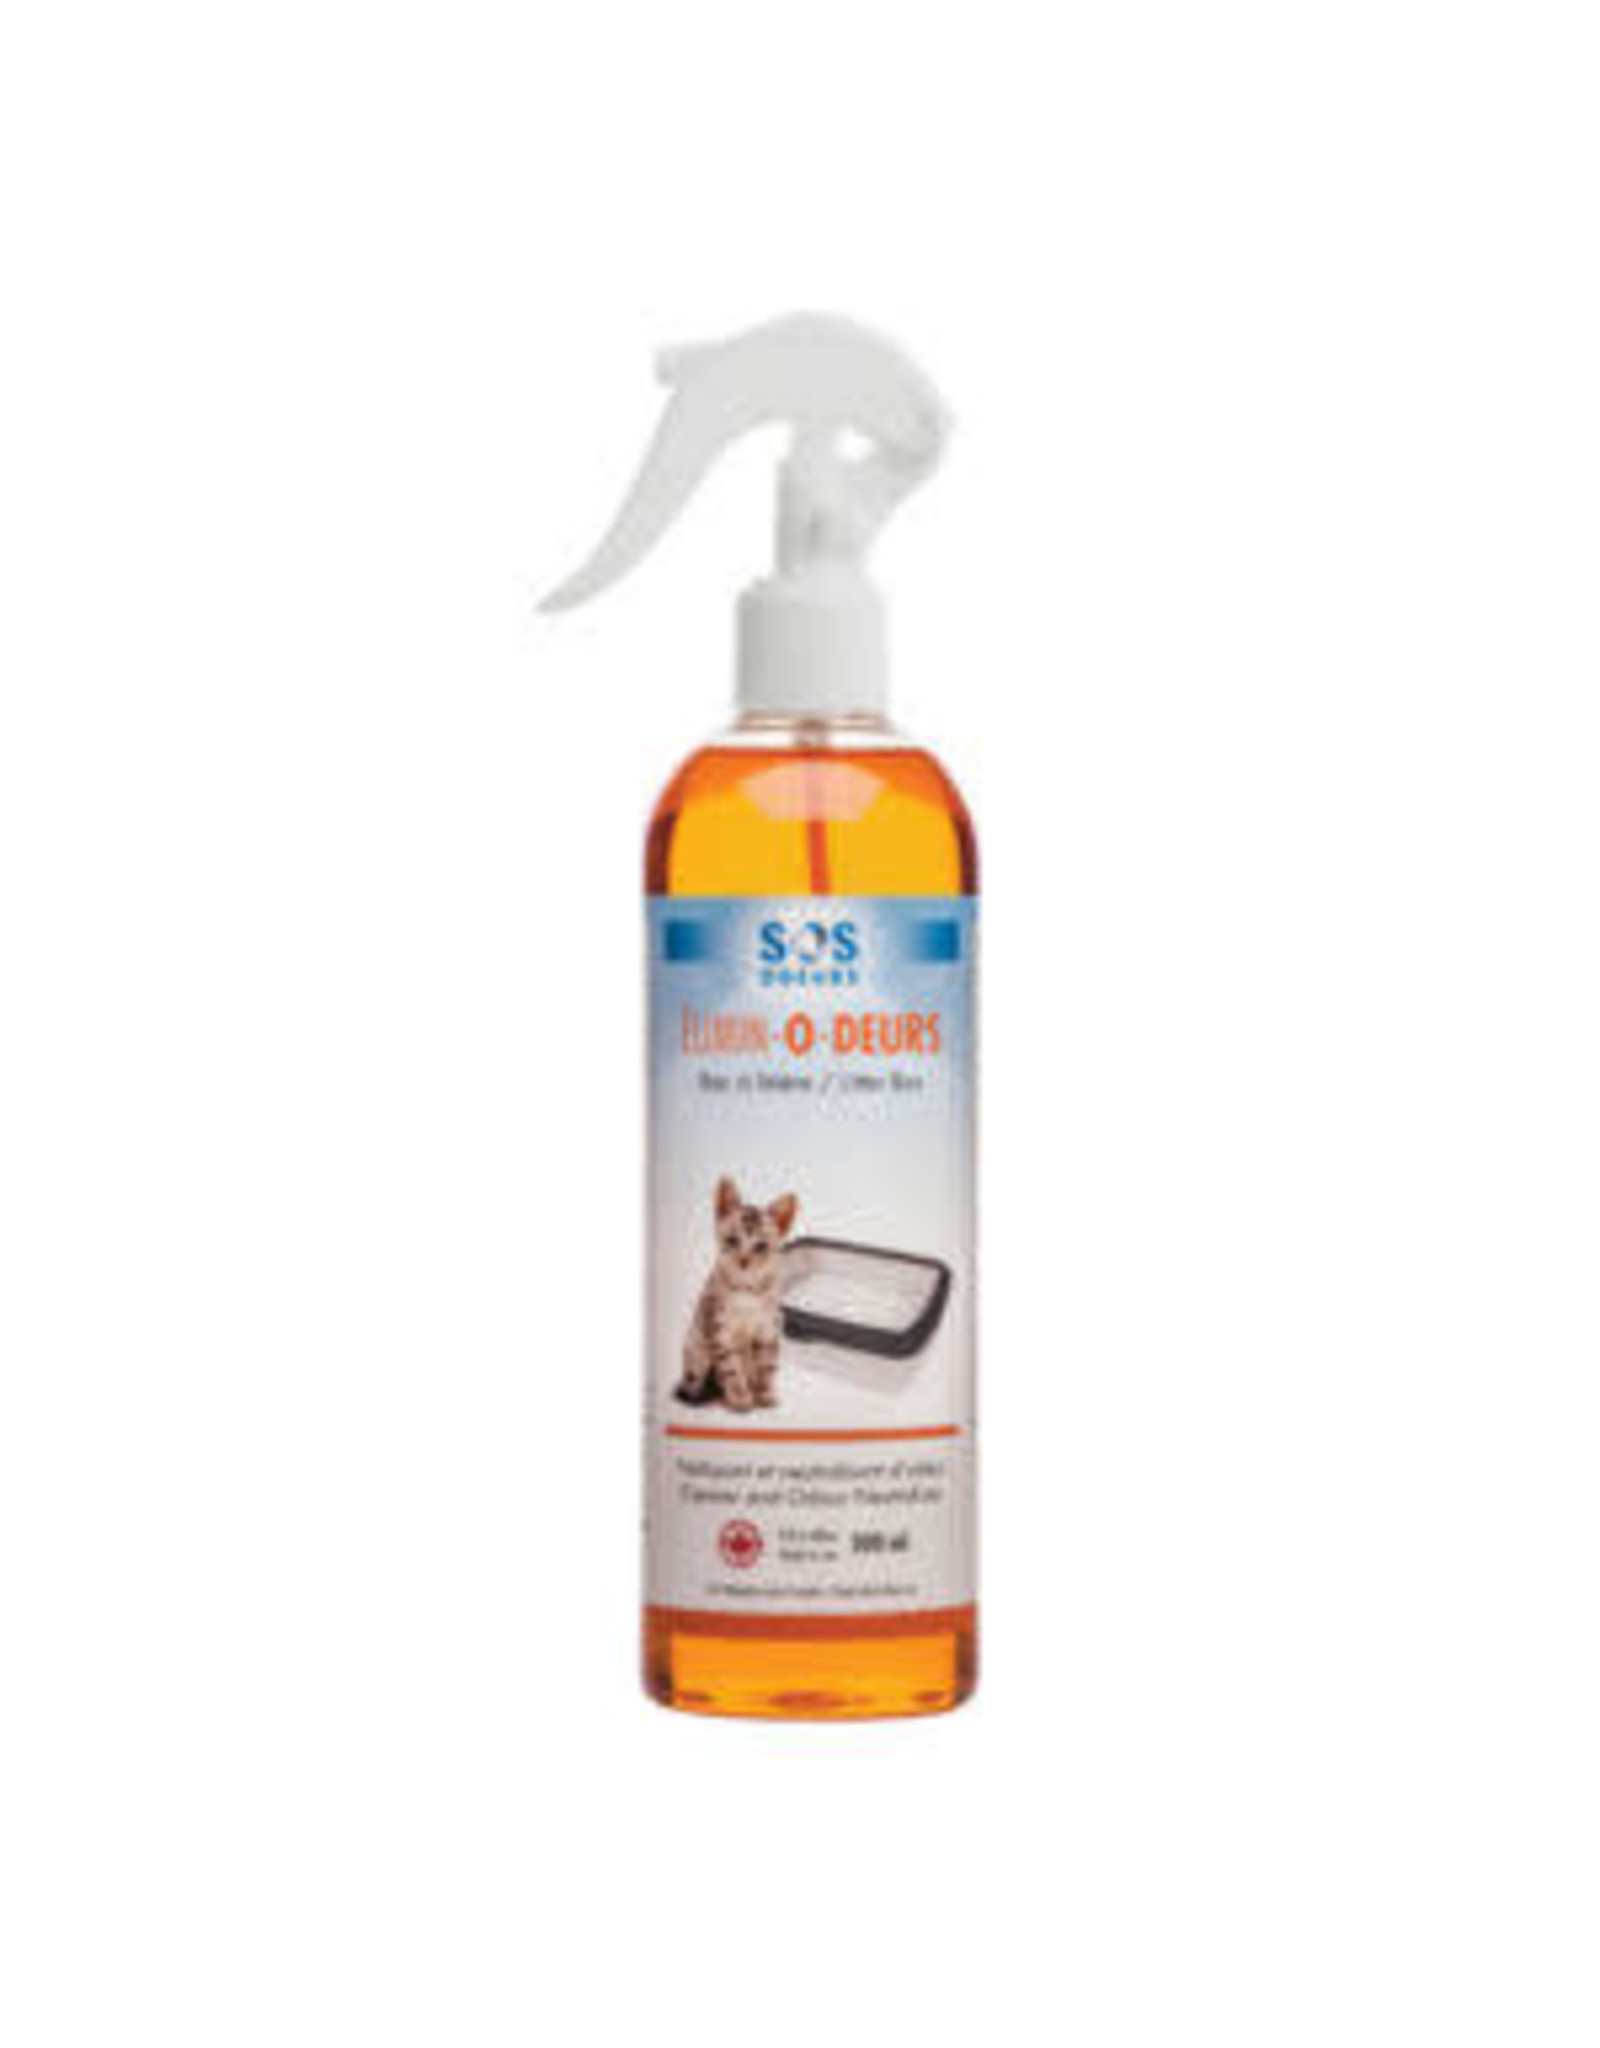 SOS Odeurs SOS Odeurs Litter Box Cleaner / Odour Neutralizer 114 ml